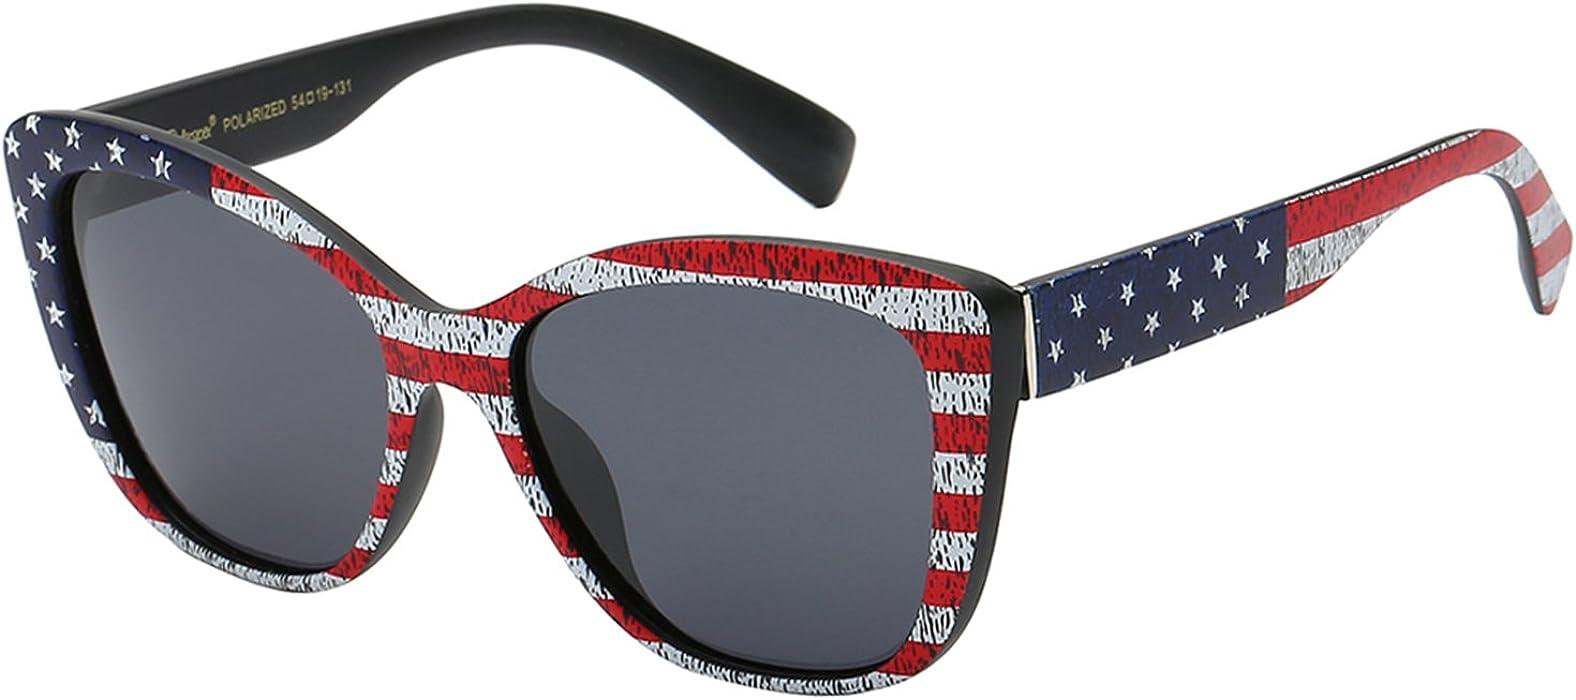 a3b5a35875 Polarspex Polarized Women s Vintage Square Jackie O Cat Eye Fashion  Sunglasses (American Flag